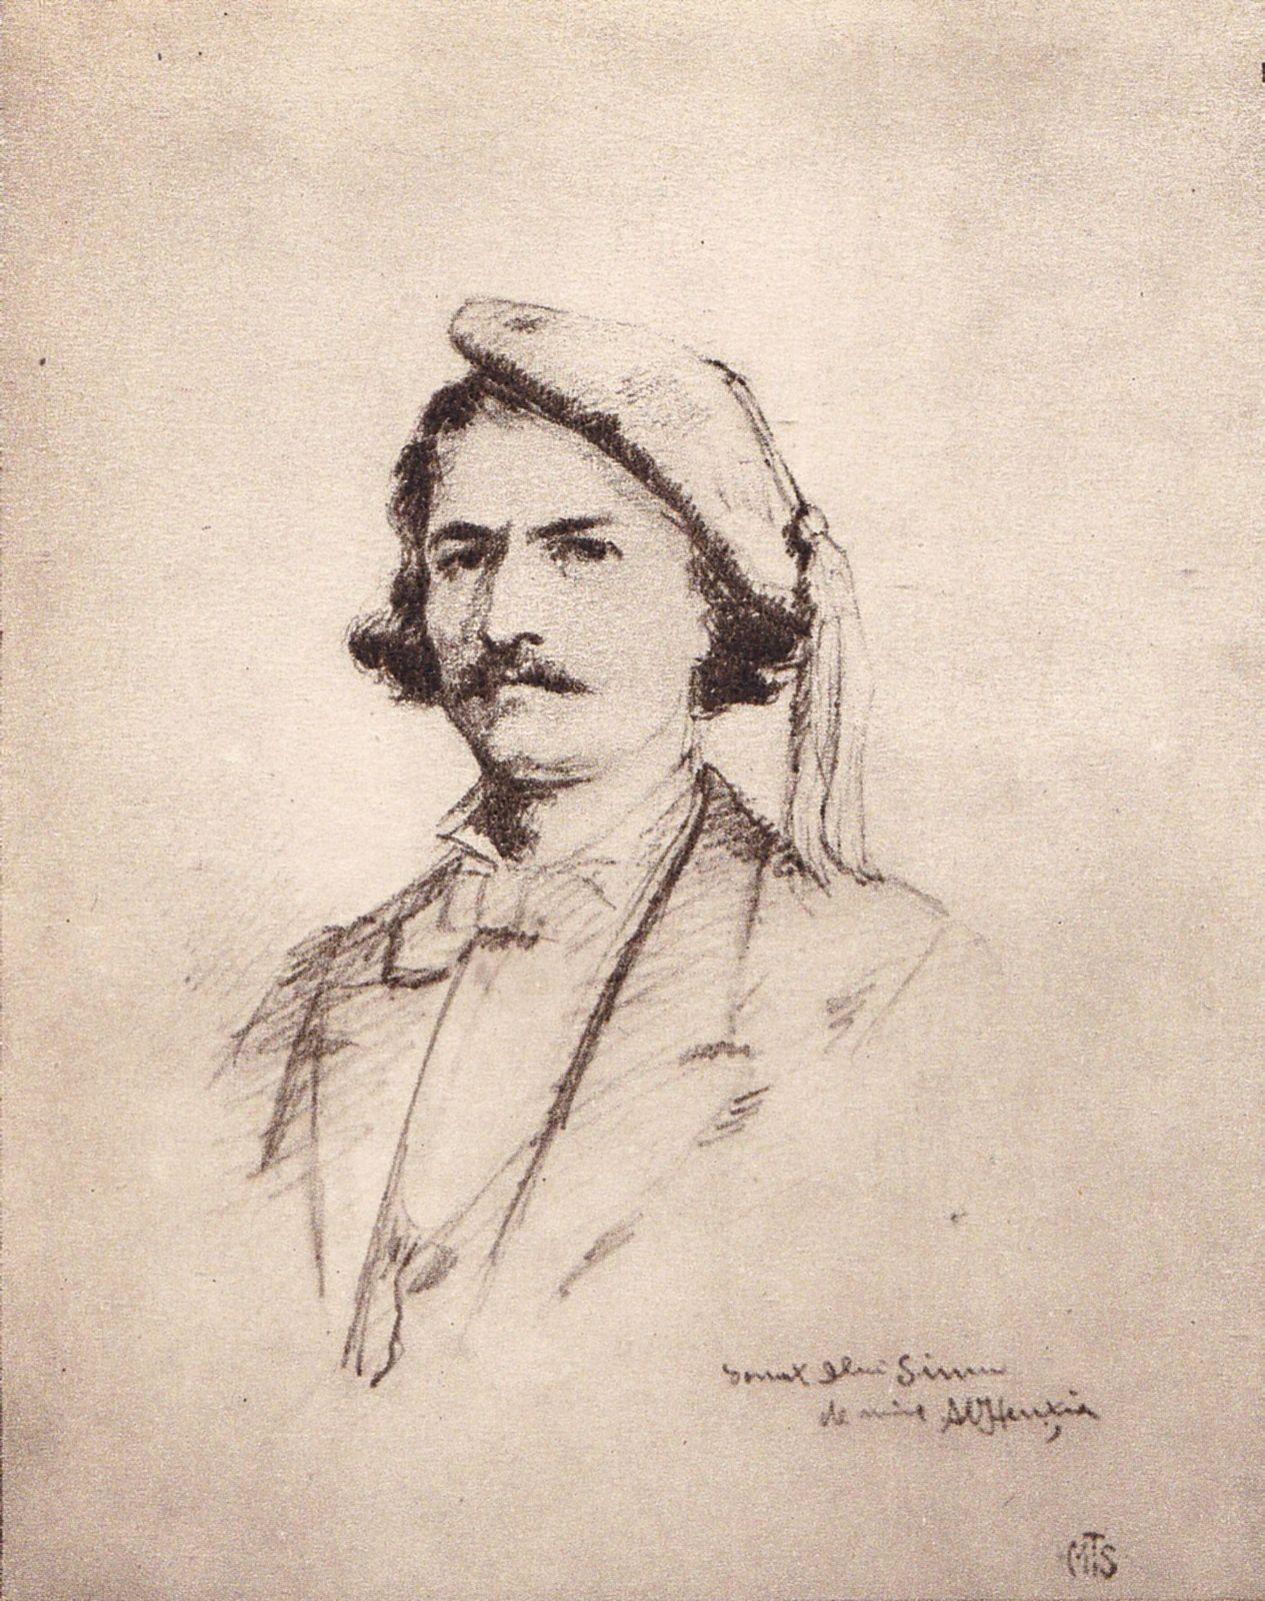 Hentia Pics intended for file:sava hentia - autoportret (1) - wikimedia commons